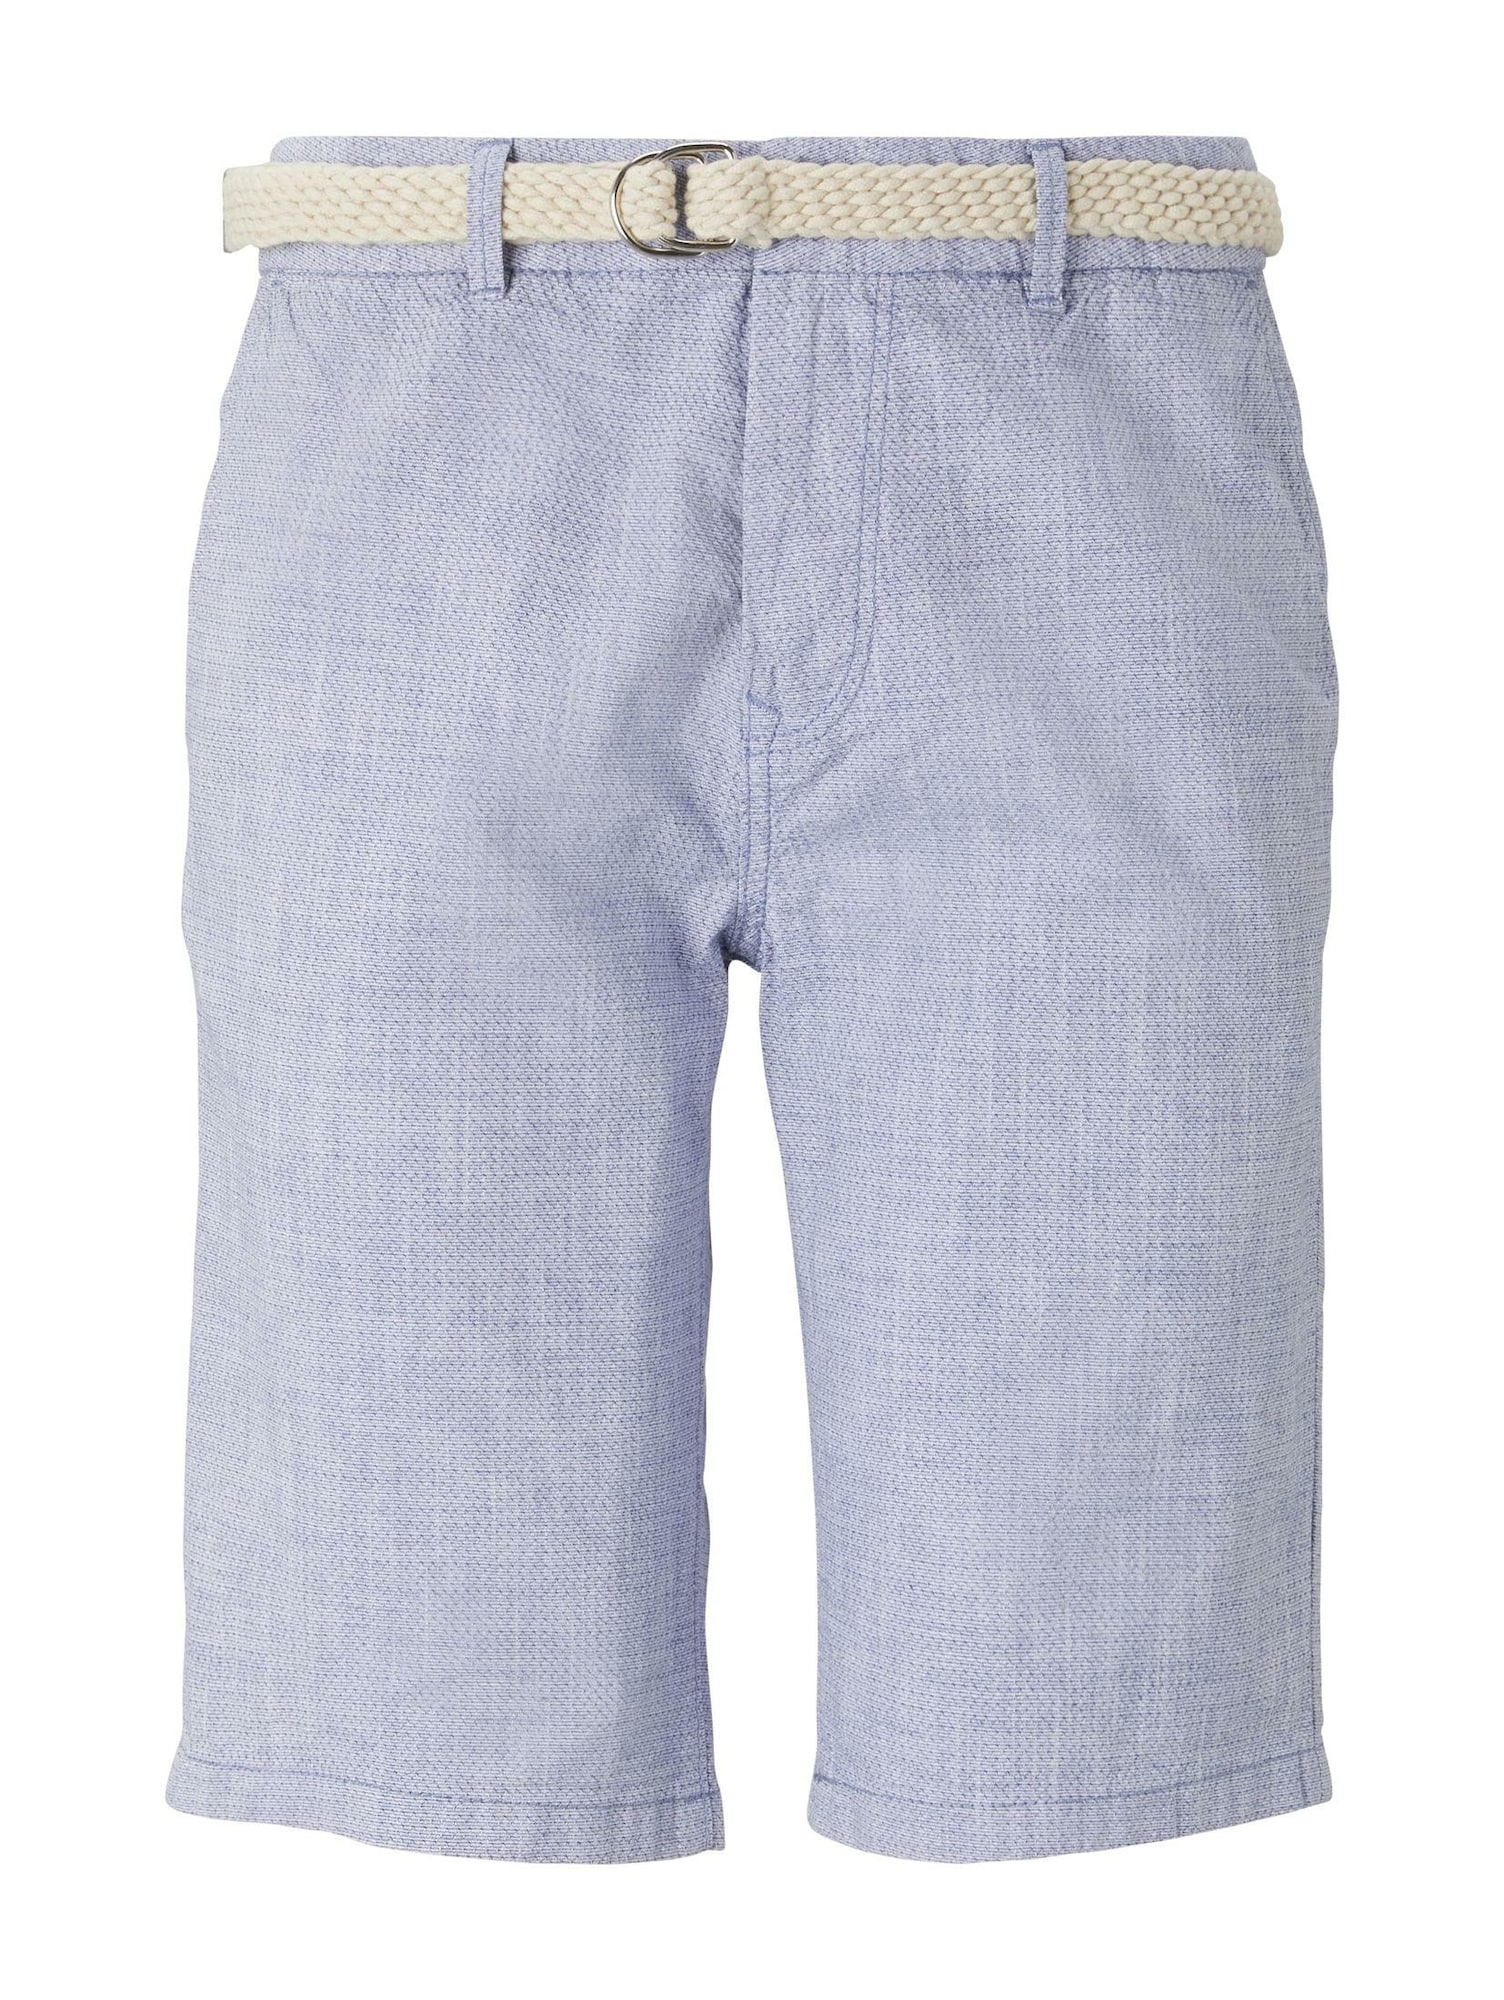 TOM TAILOR DENIM Chino kalhoty  opálová